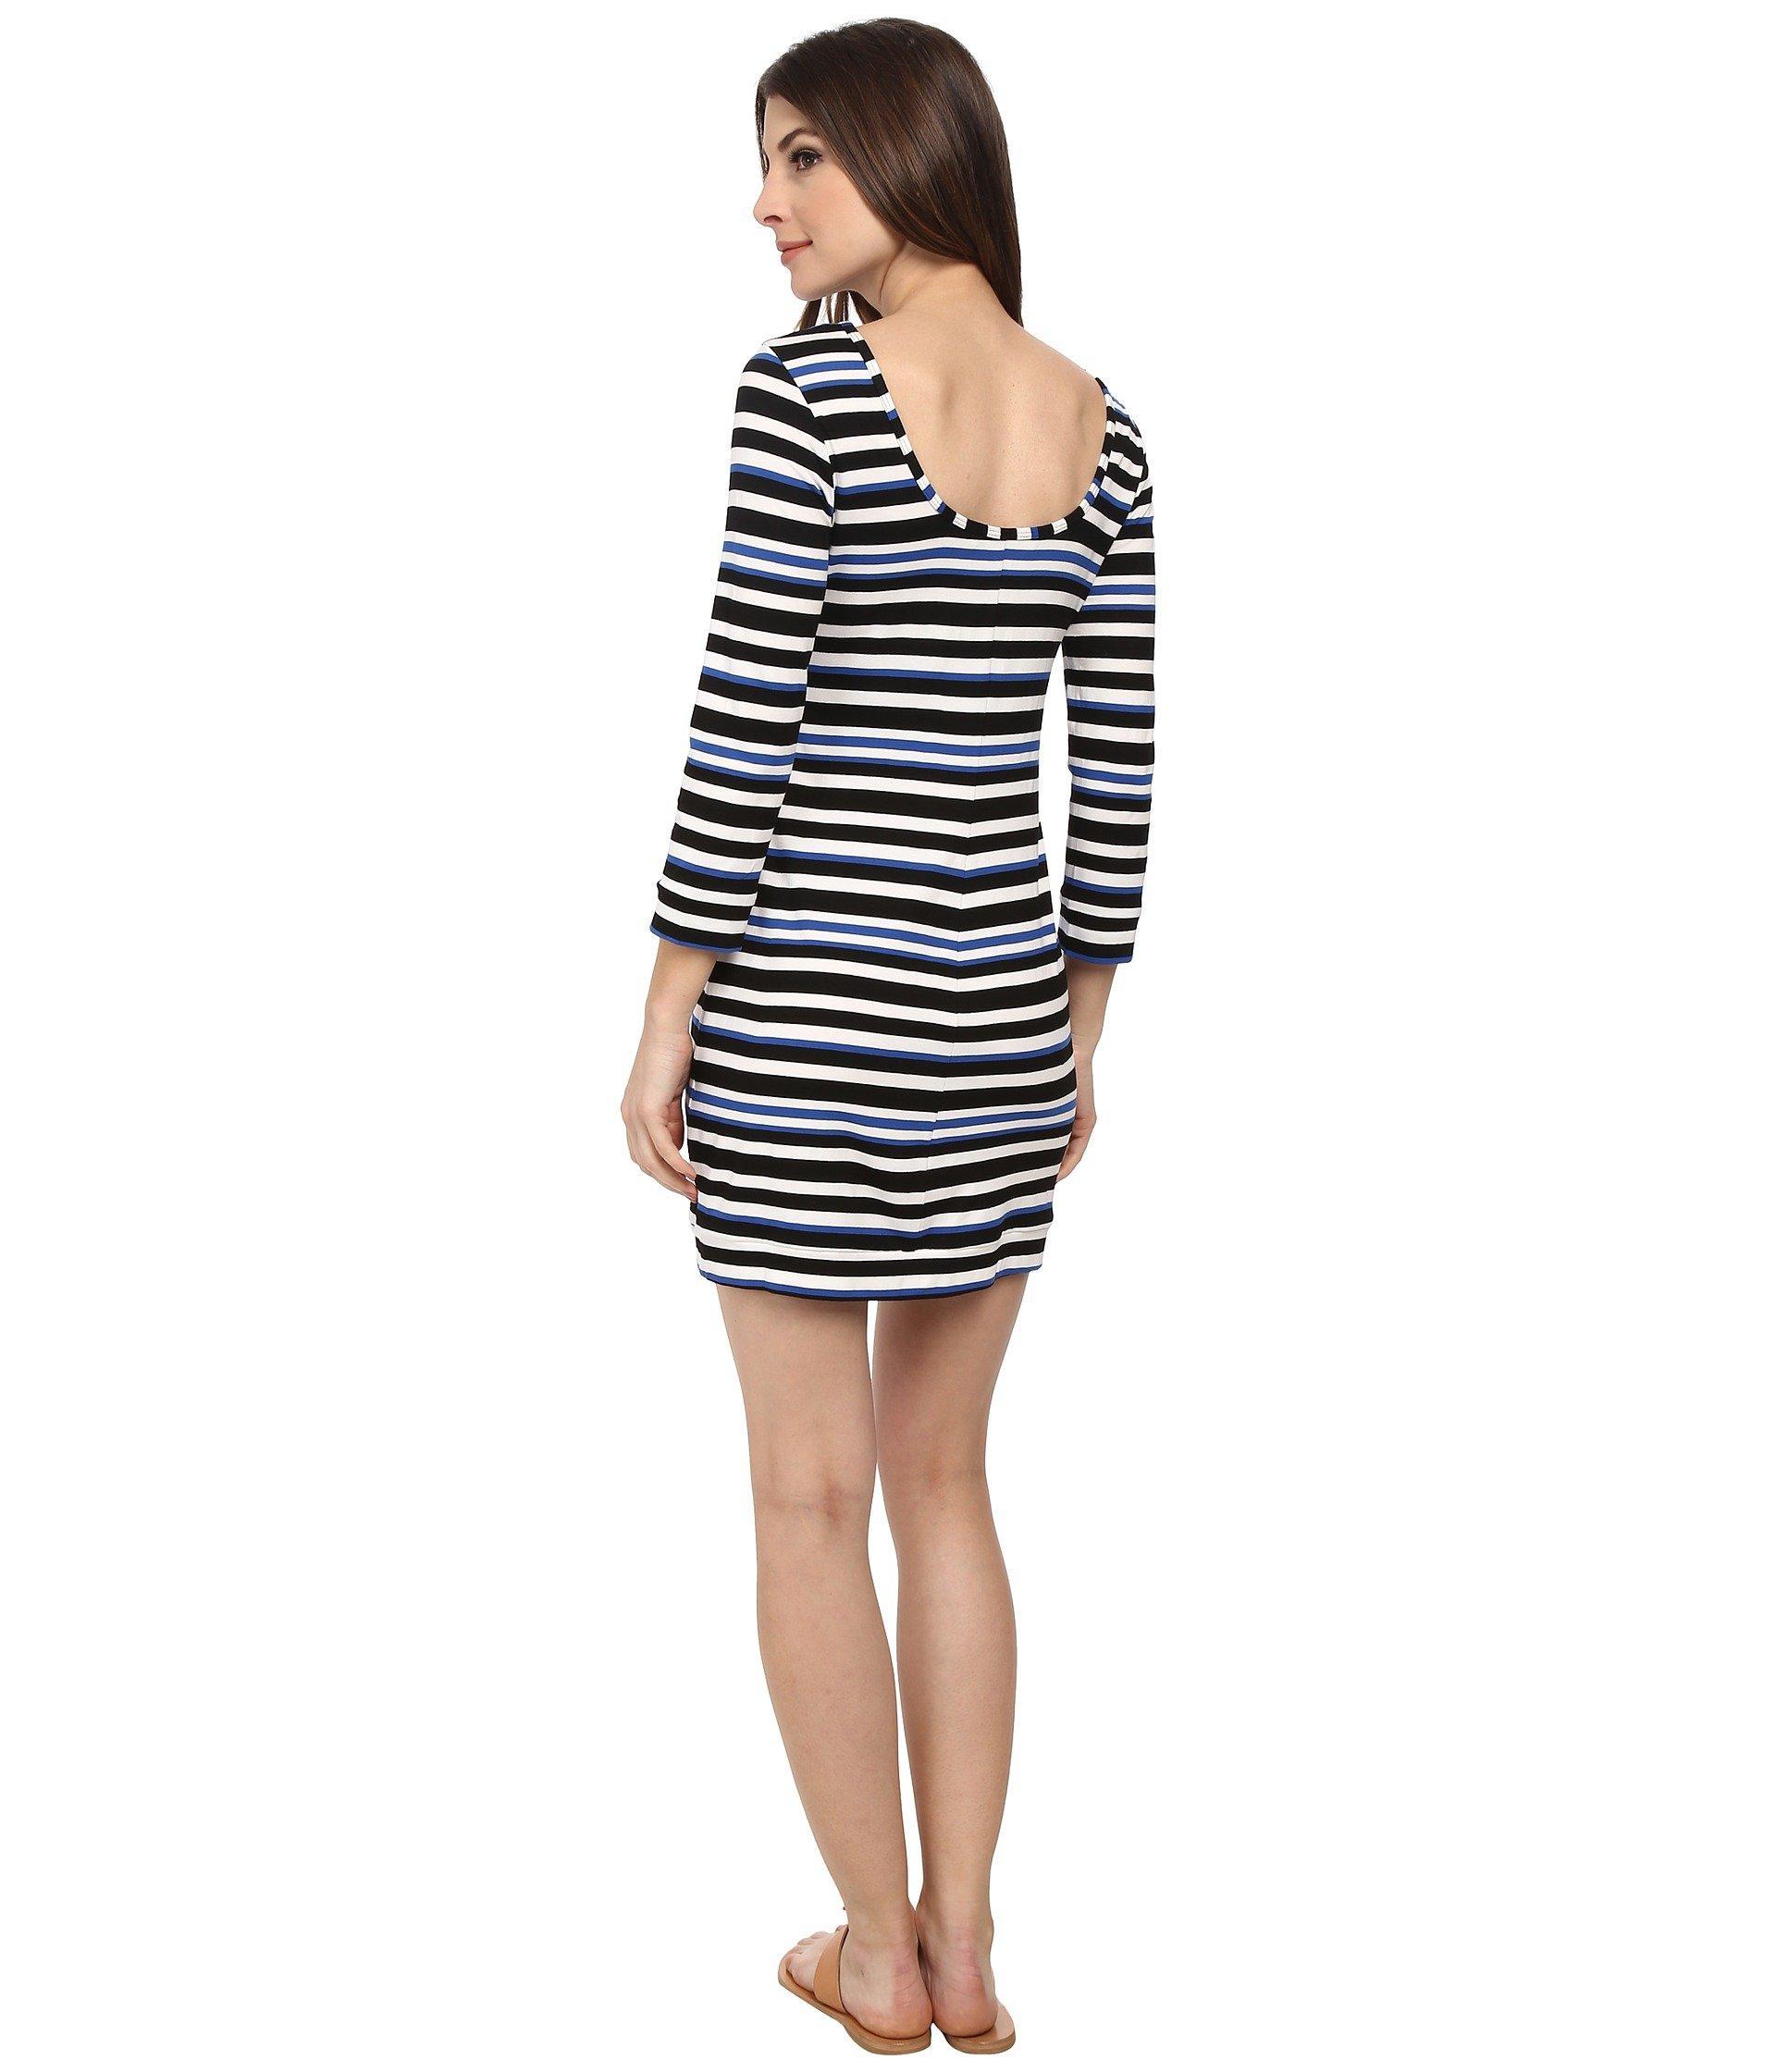 9ff3d8d4c38 Lyst - Trina Turk Indio Dress in Blue